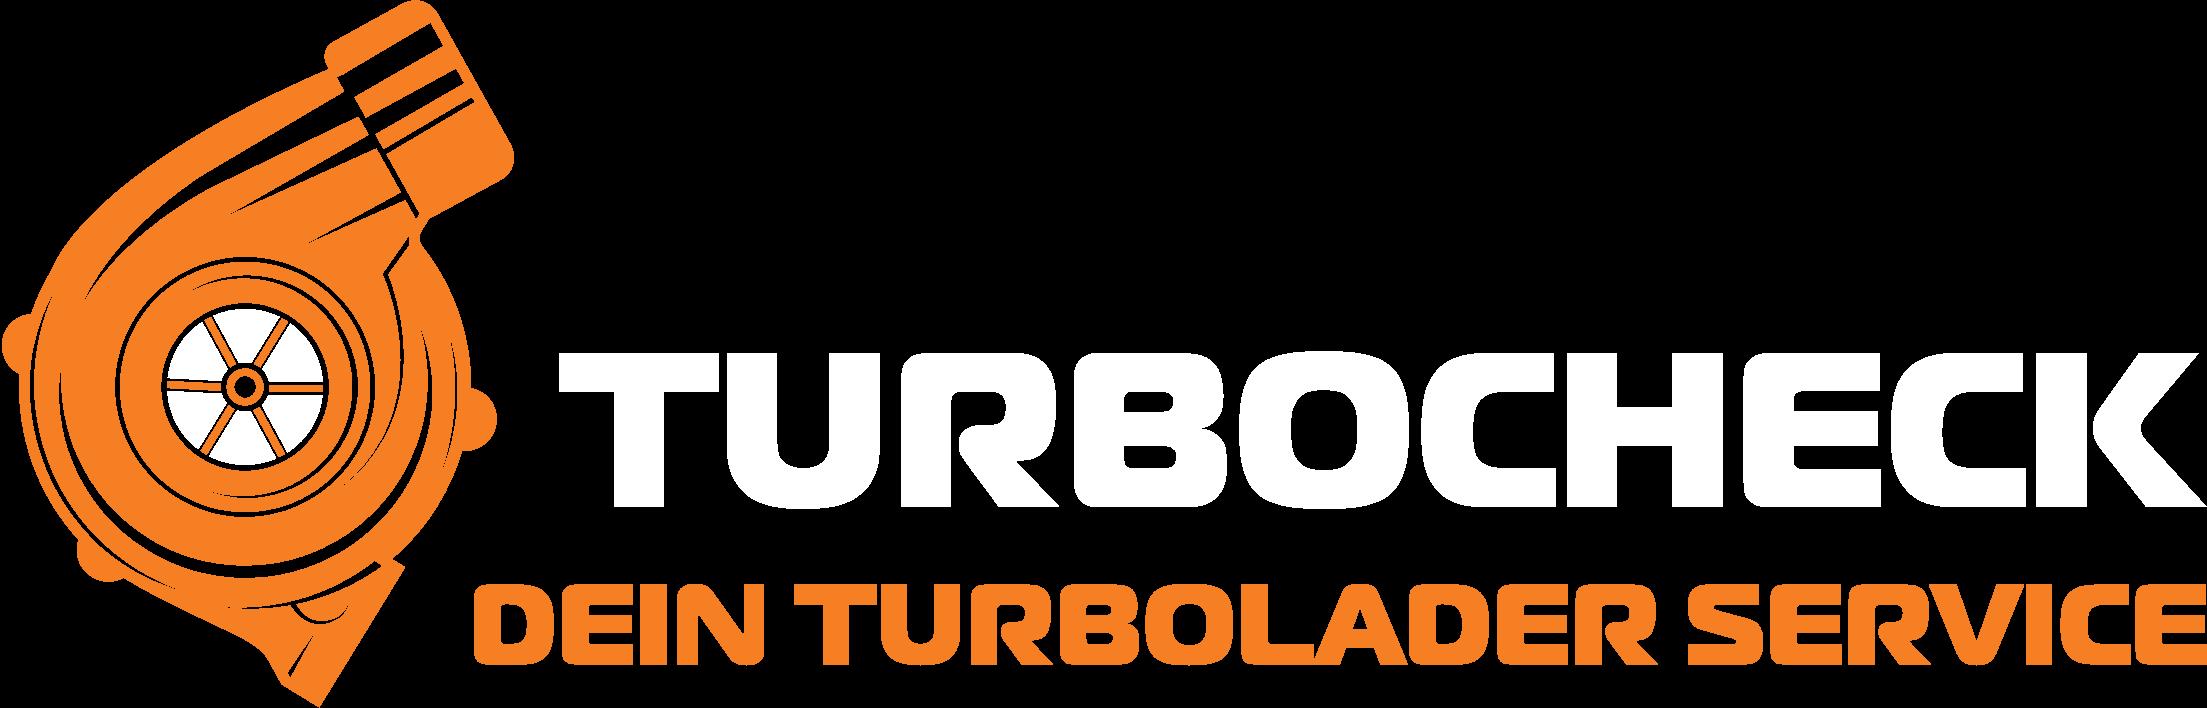 Turbocheck